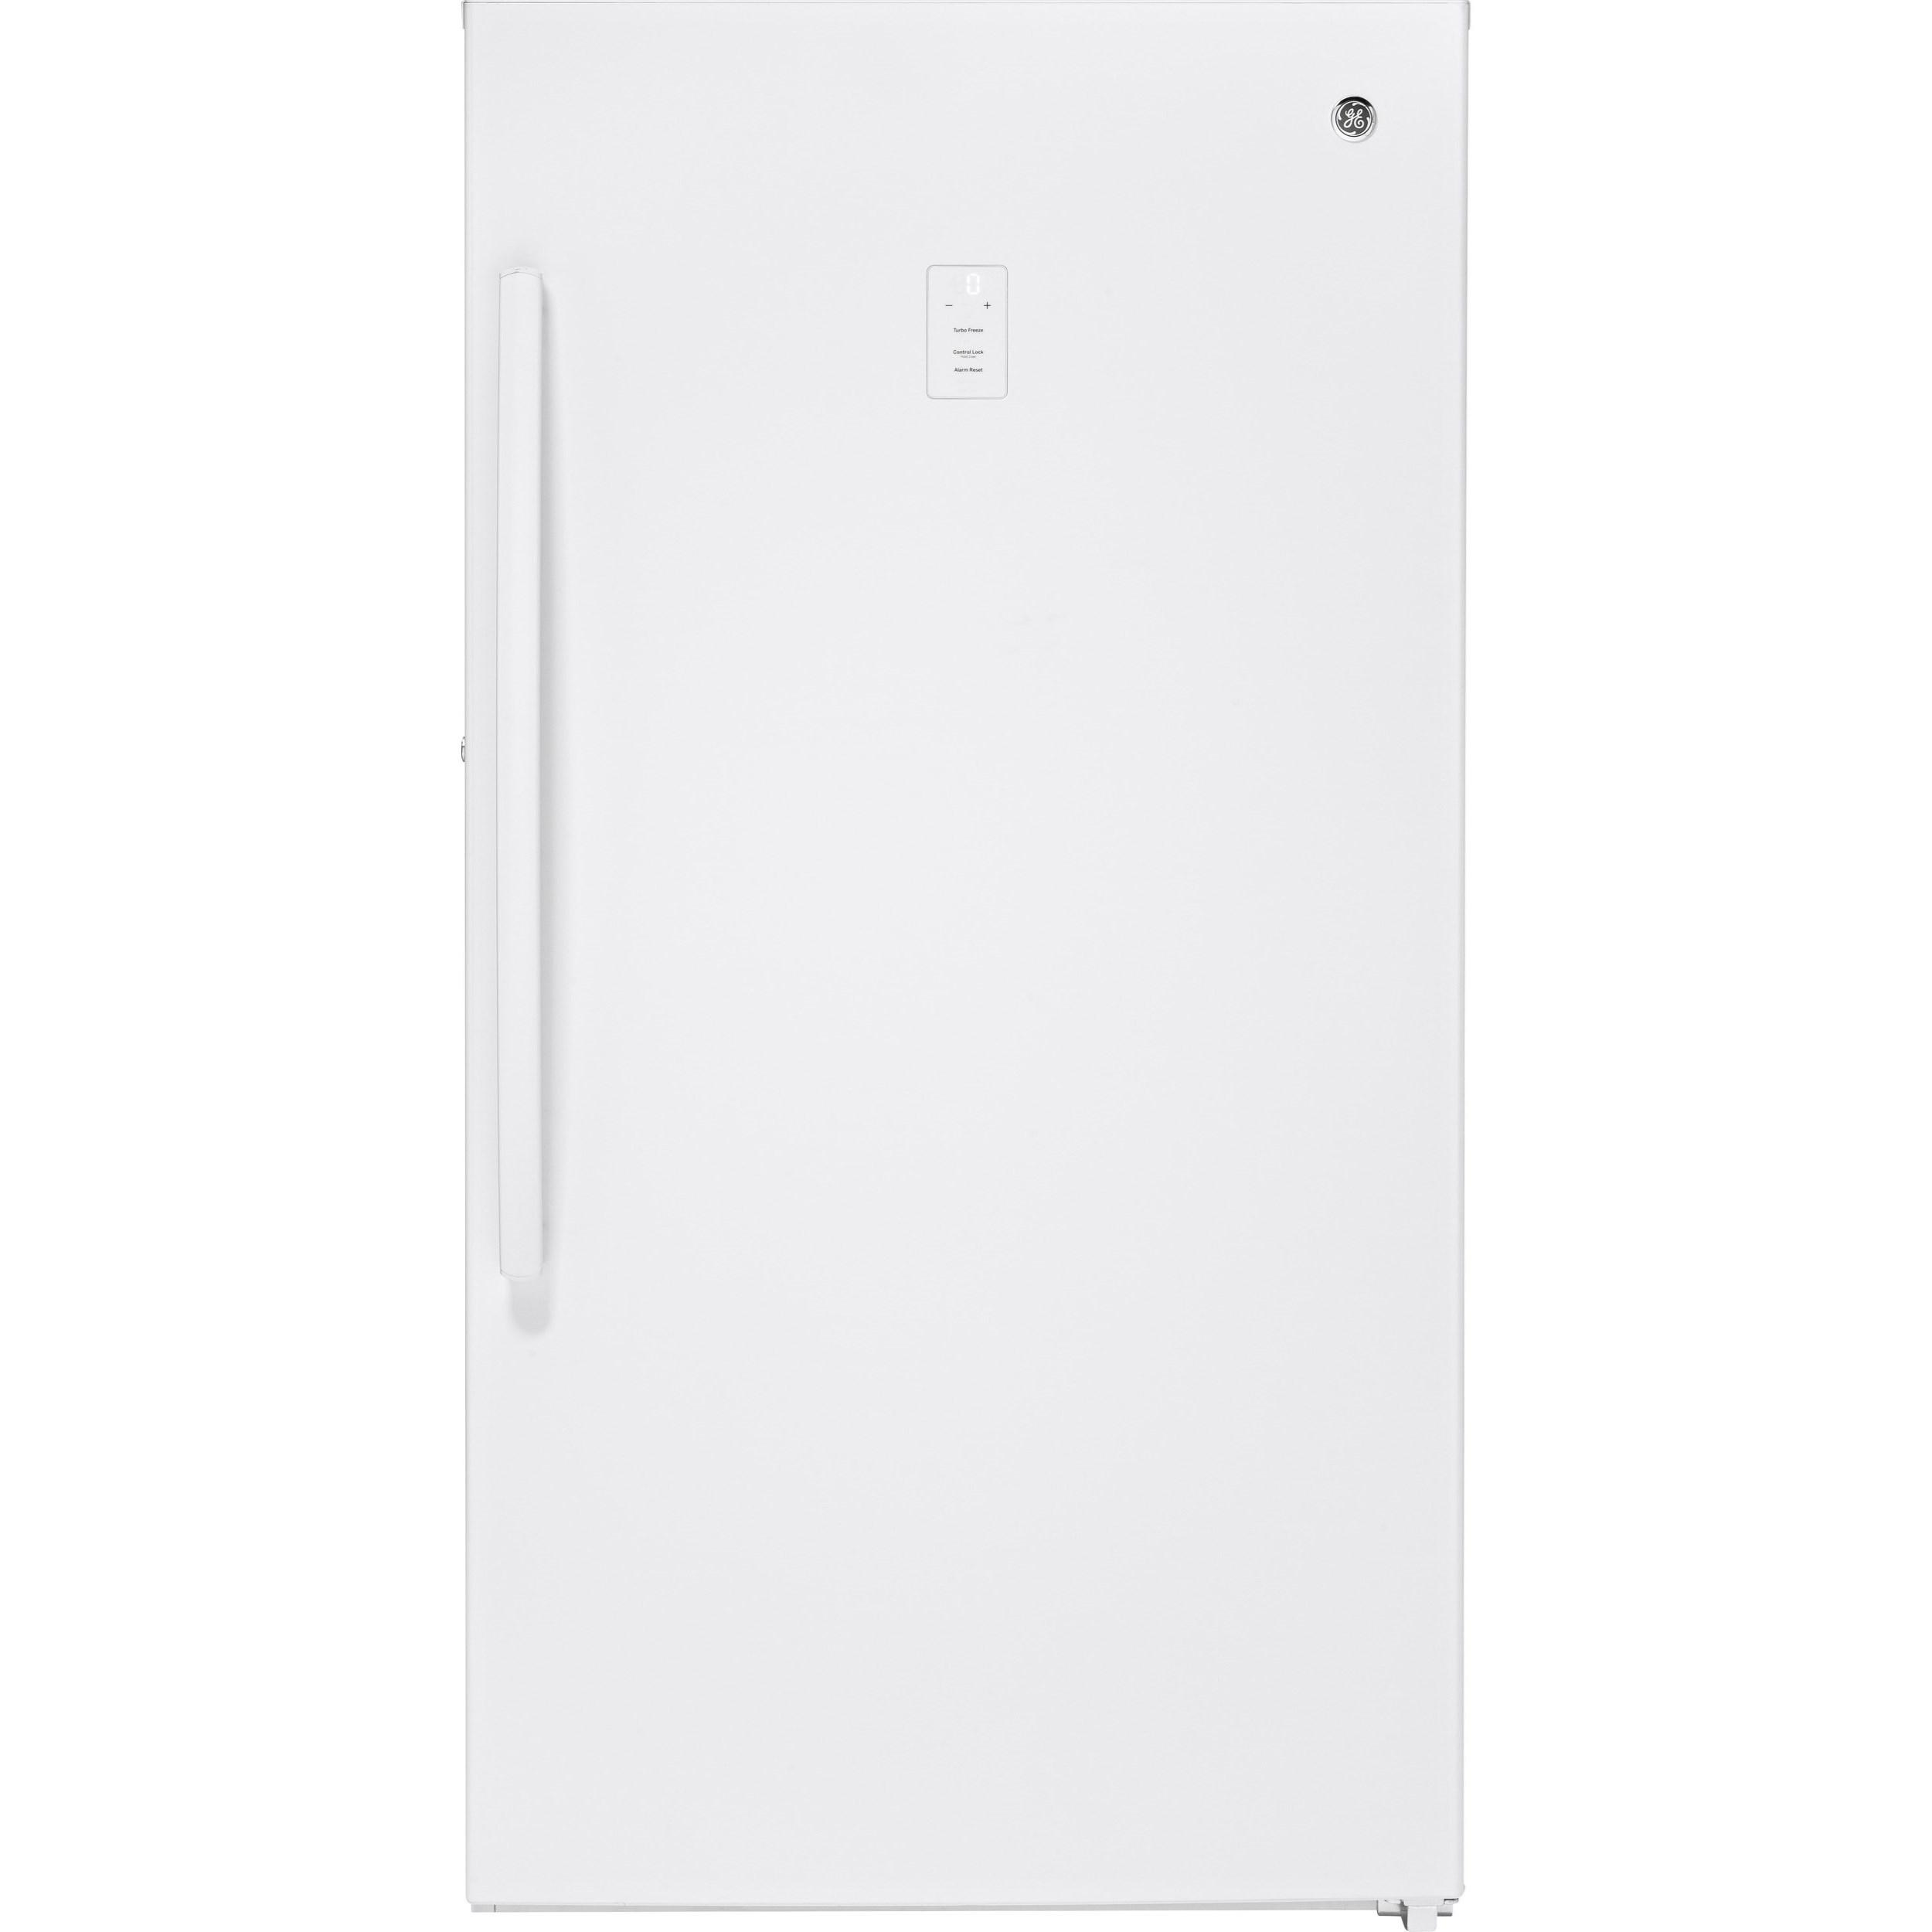 Upright Freezer 17.3 Cu. Ft. Frost-Free Upright Freezer by GE Appliances at Westrich Furniture & Appliances